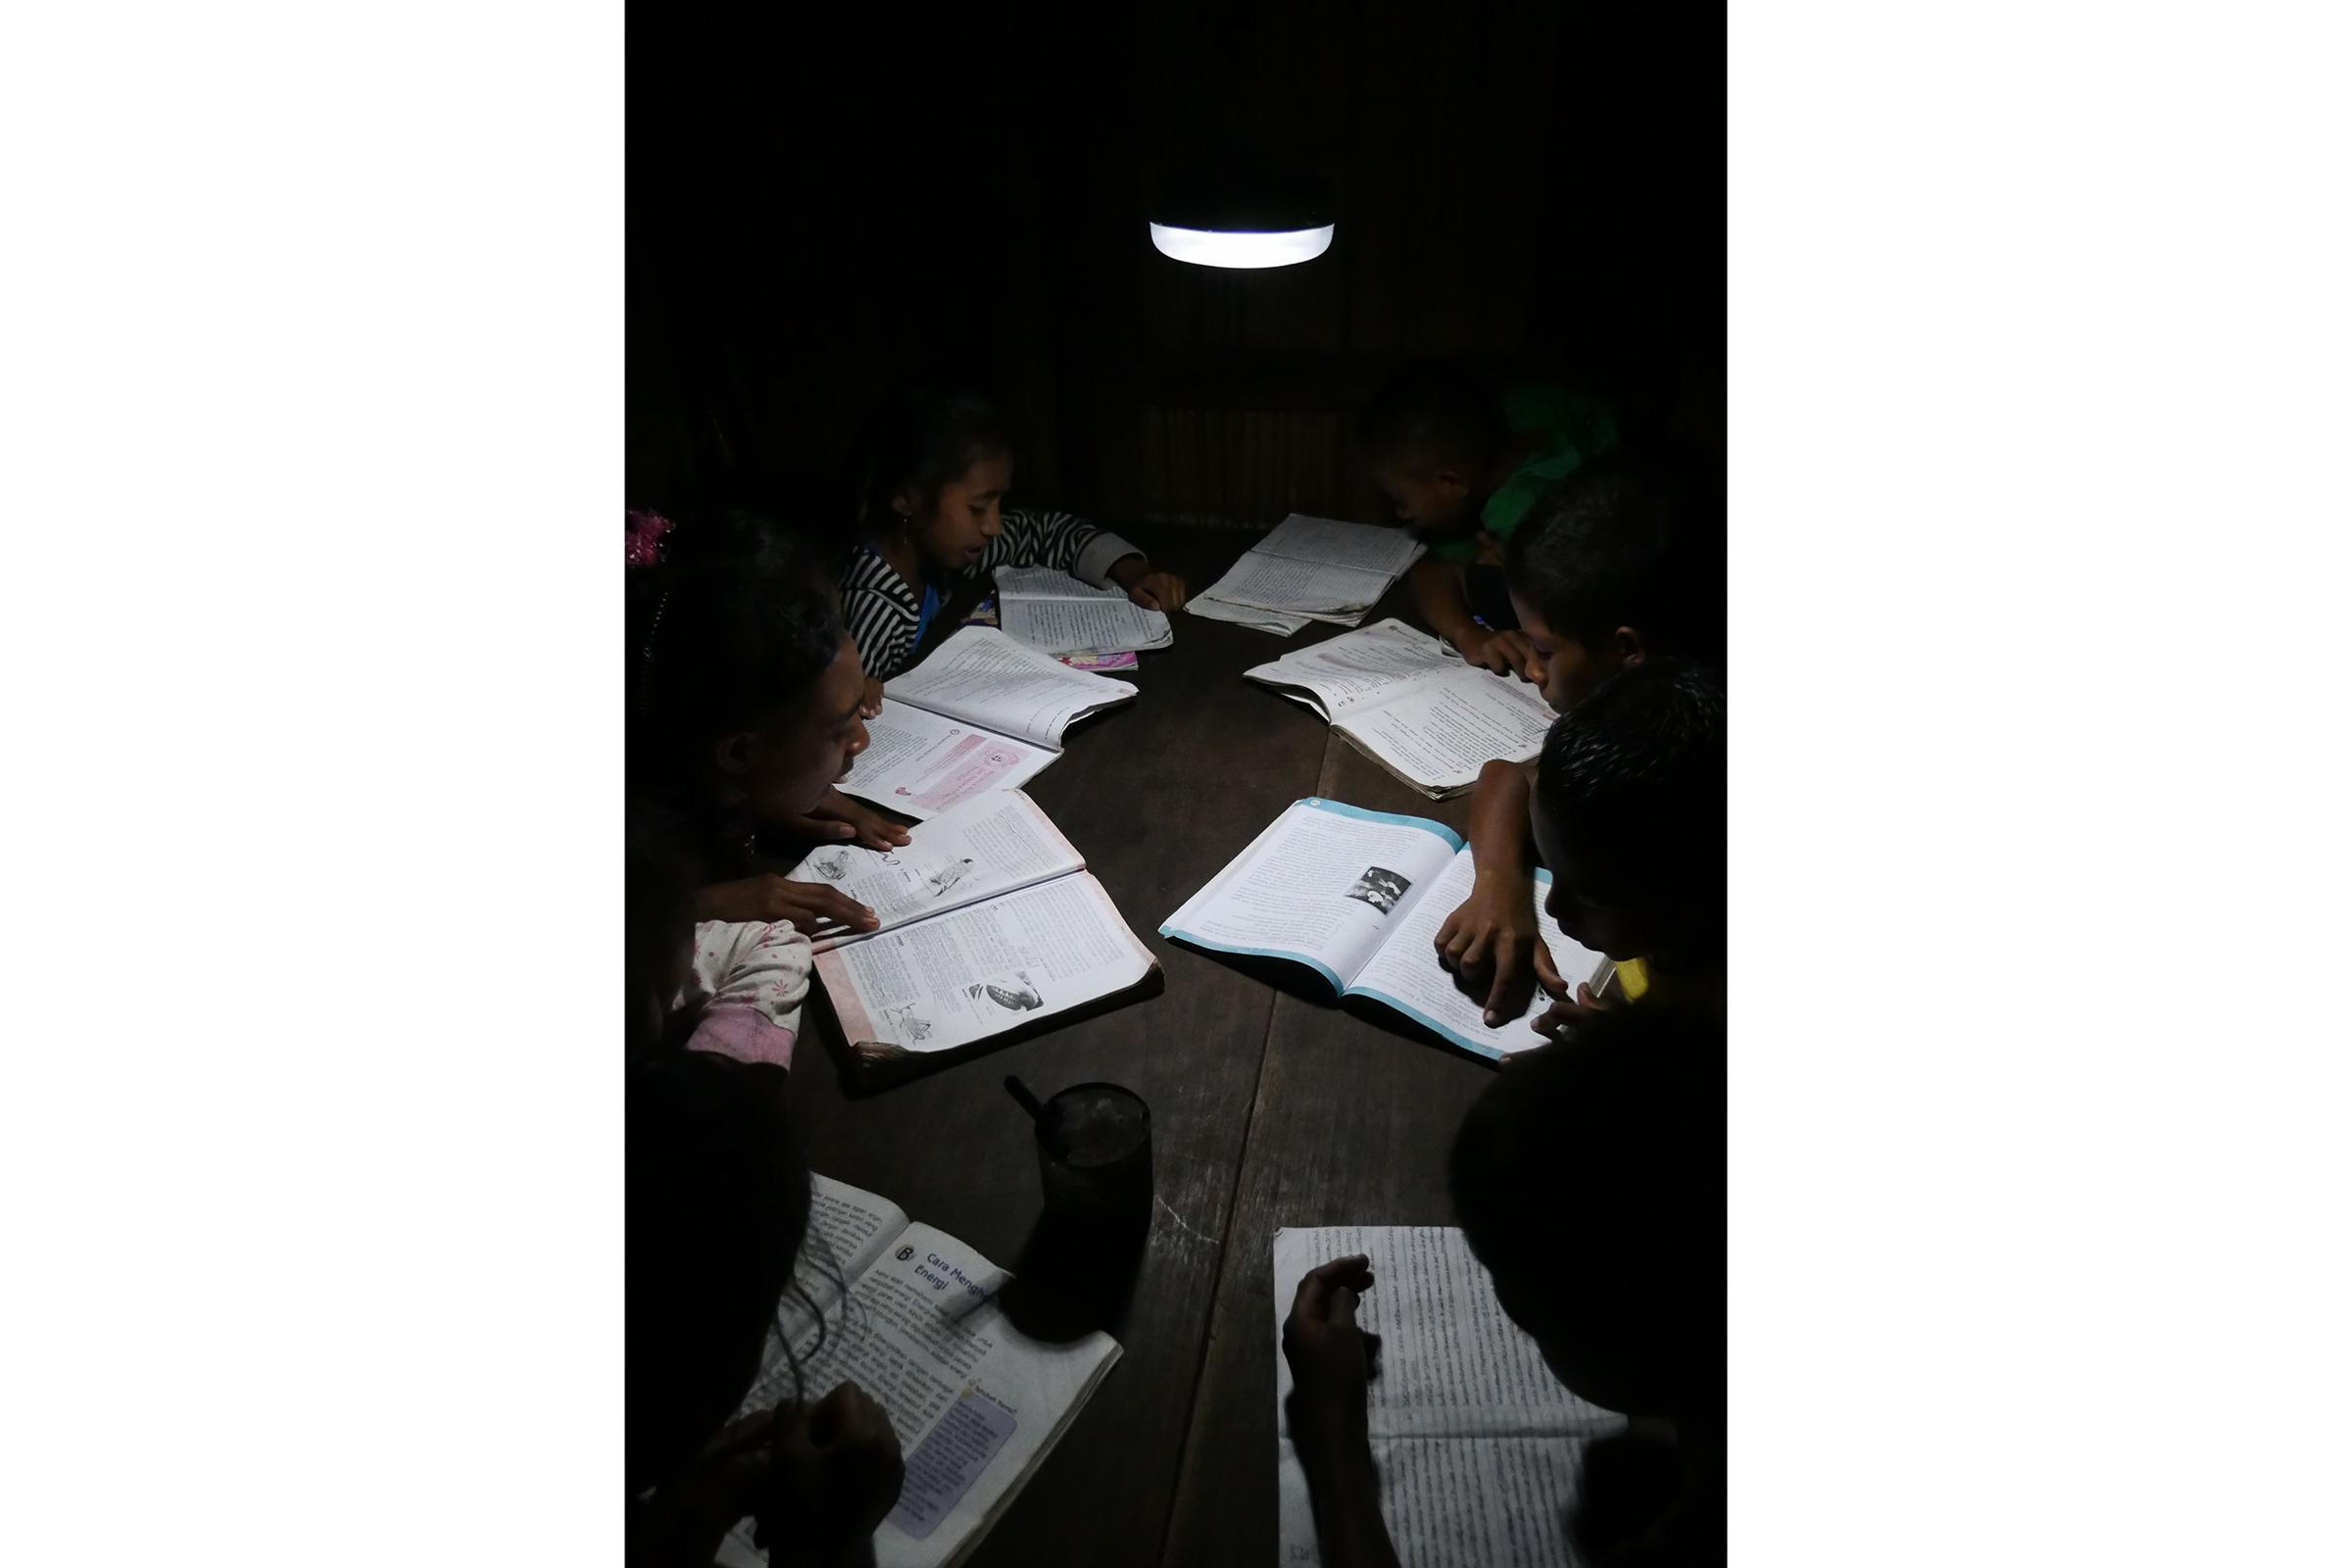 photo: panasonic's solar lanterns utilized in Indonesia